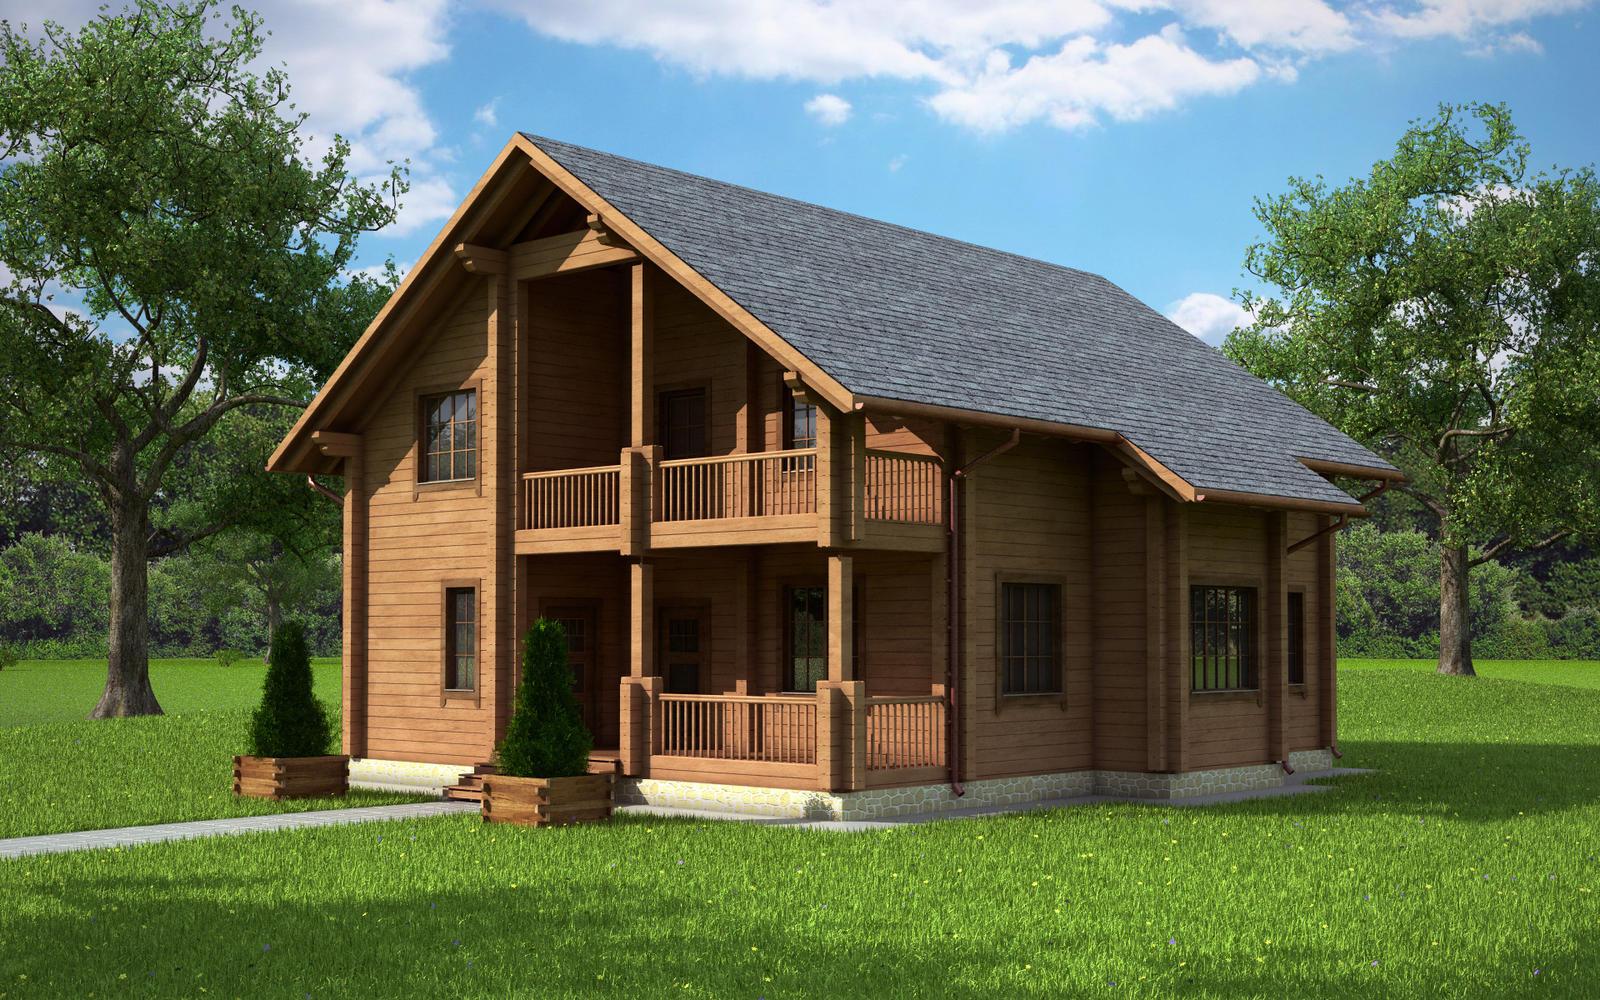 Cottage house one by lsr33 on deviantart Cottagehouse